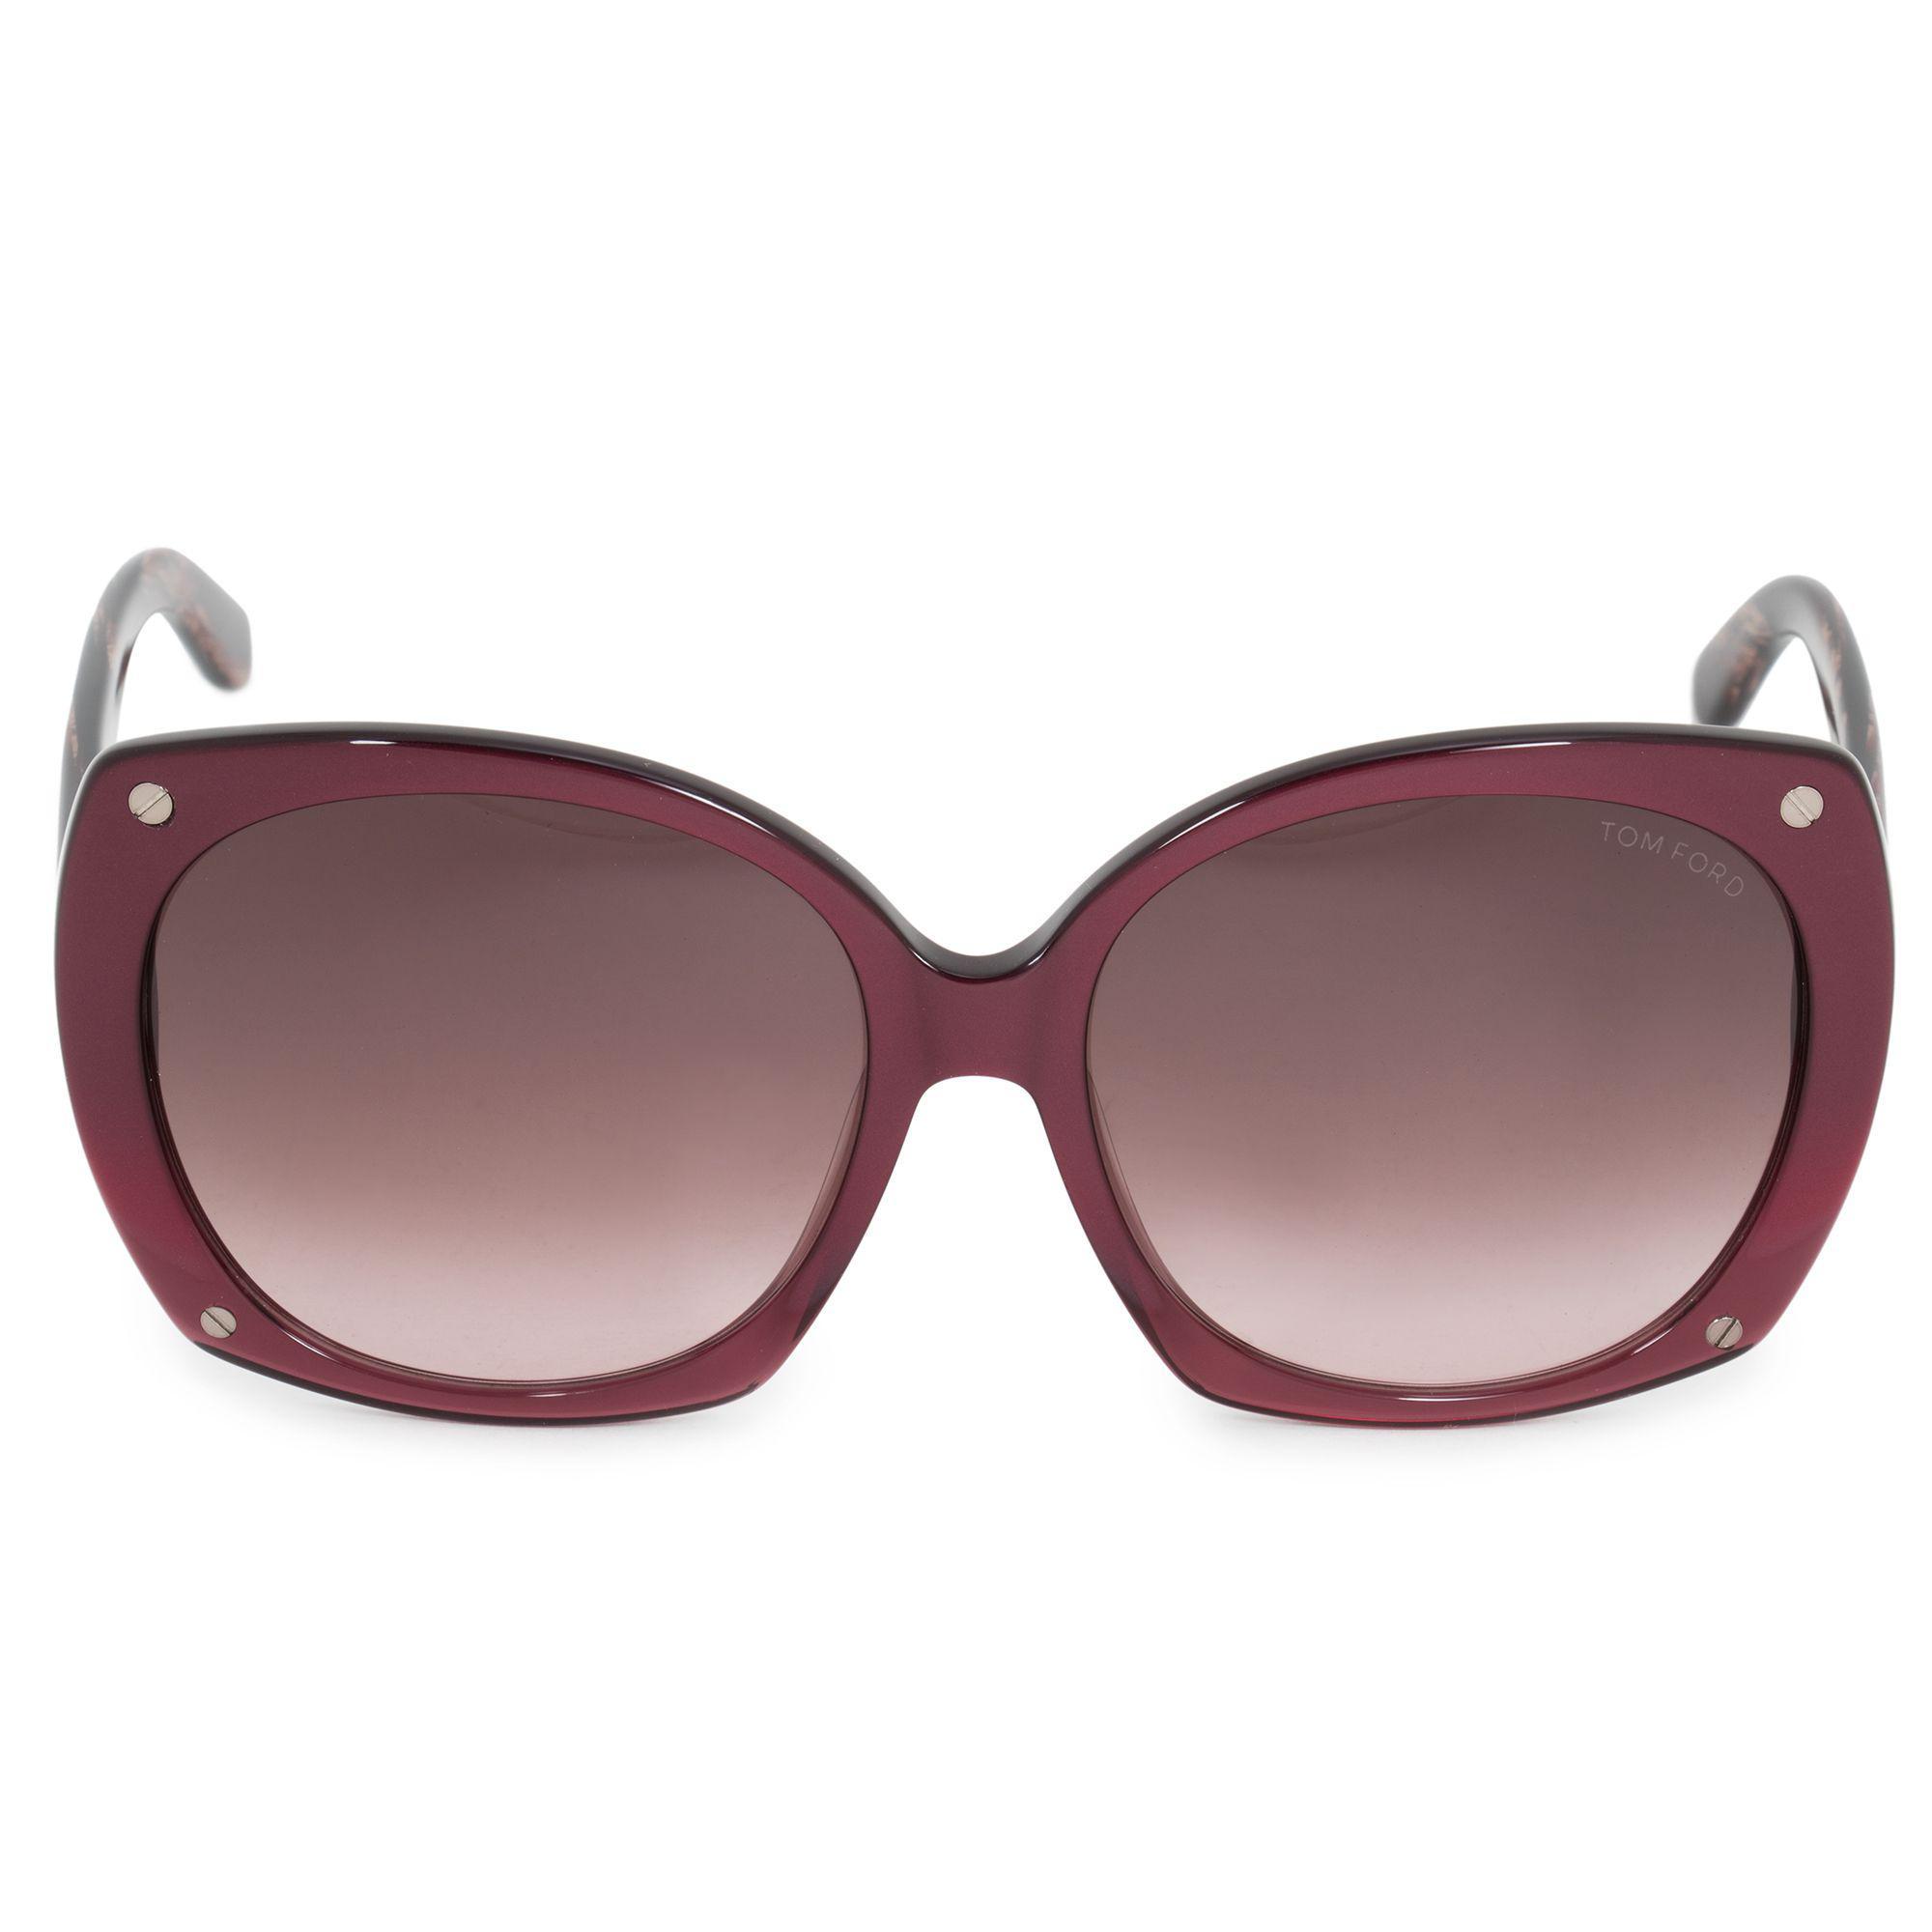 3afb81cf4e Lyst - Tom Ford Gabriella Oval Sunglasses Ft0362 80b 59